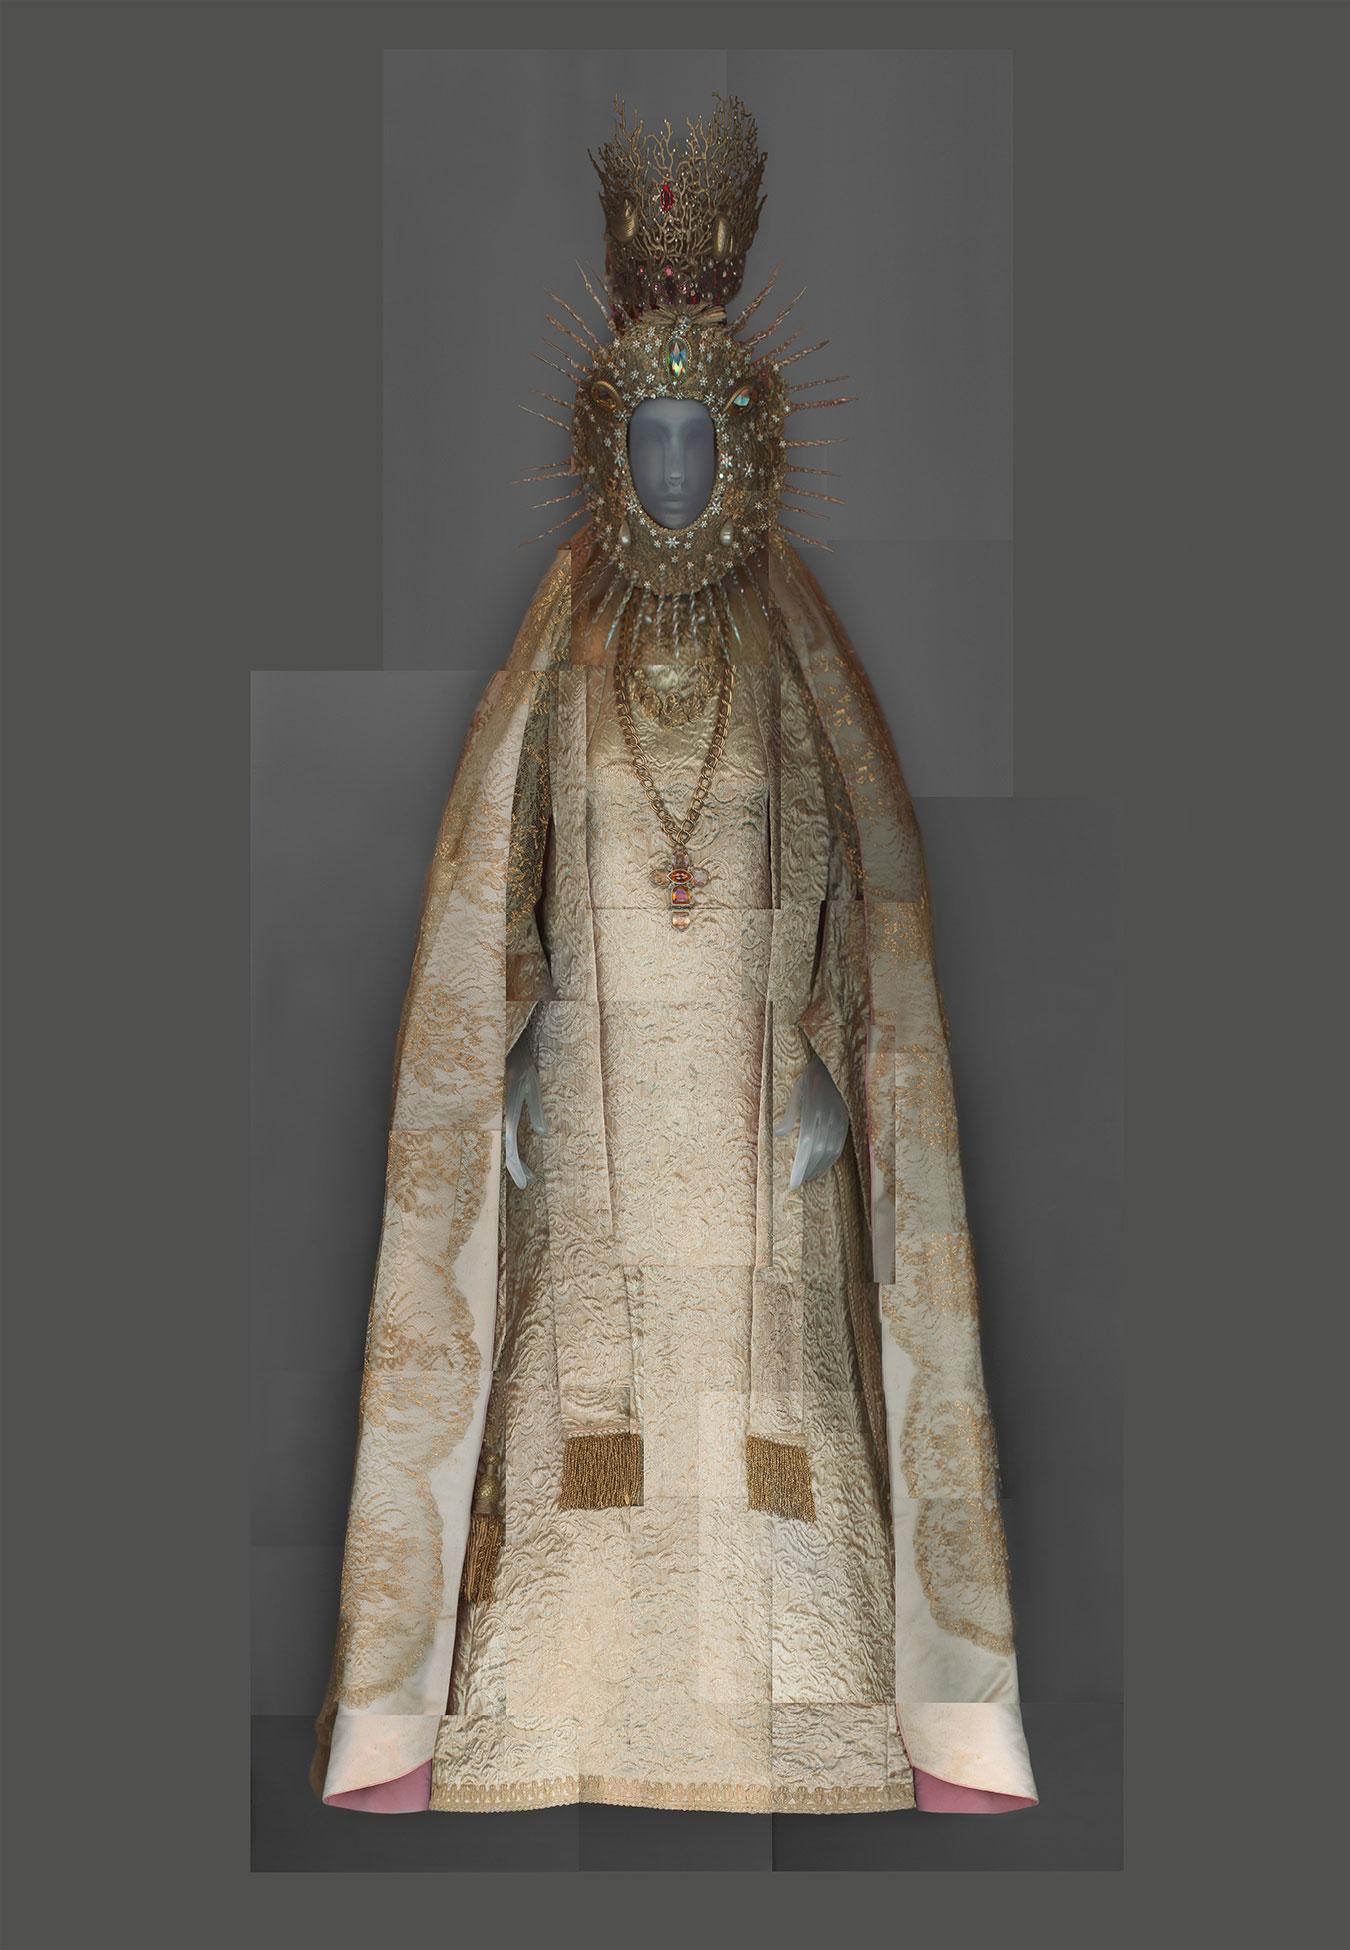 Statuary Vestment for the Virgin of El Rocío, YVES SAINT LAURENT | ca. 1985 | Courtesy of Chapelle Notre-Dame de Compassion, Paris | Image courtesy of The Metropolitan Museum of Art | Digital Composite Scan by Katerina Jebb